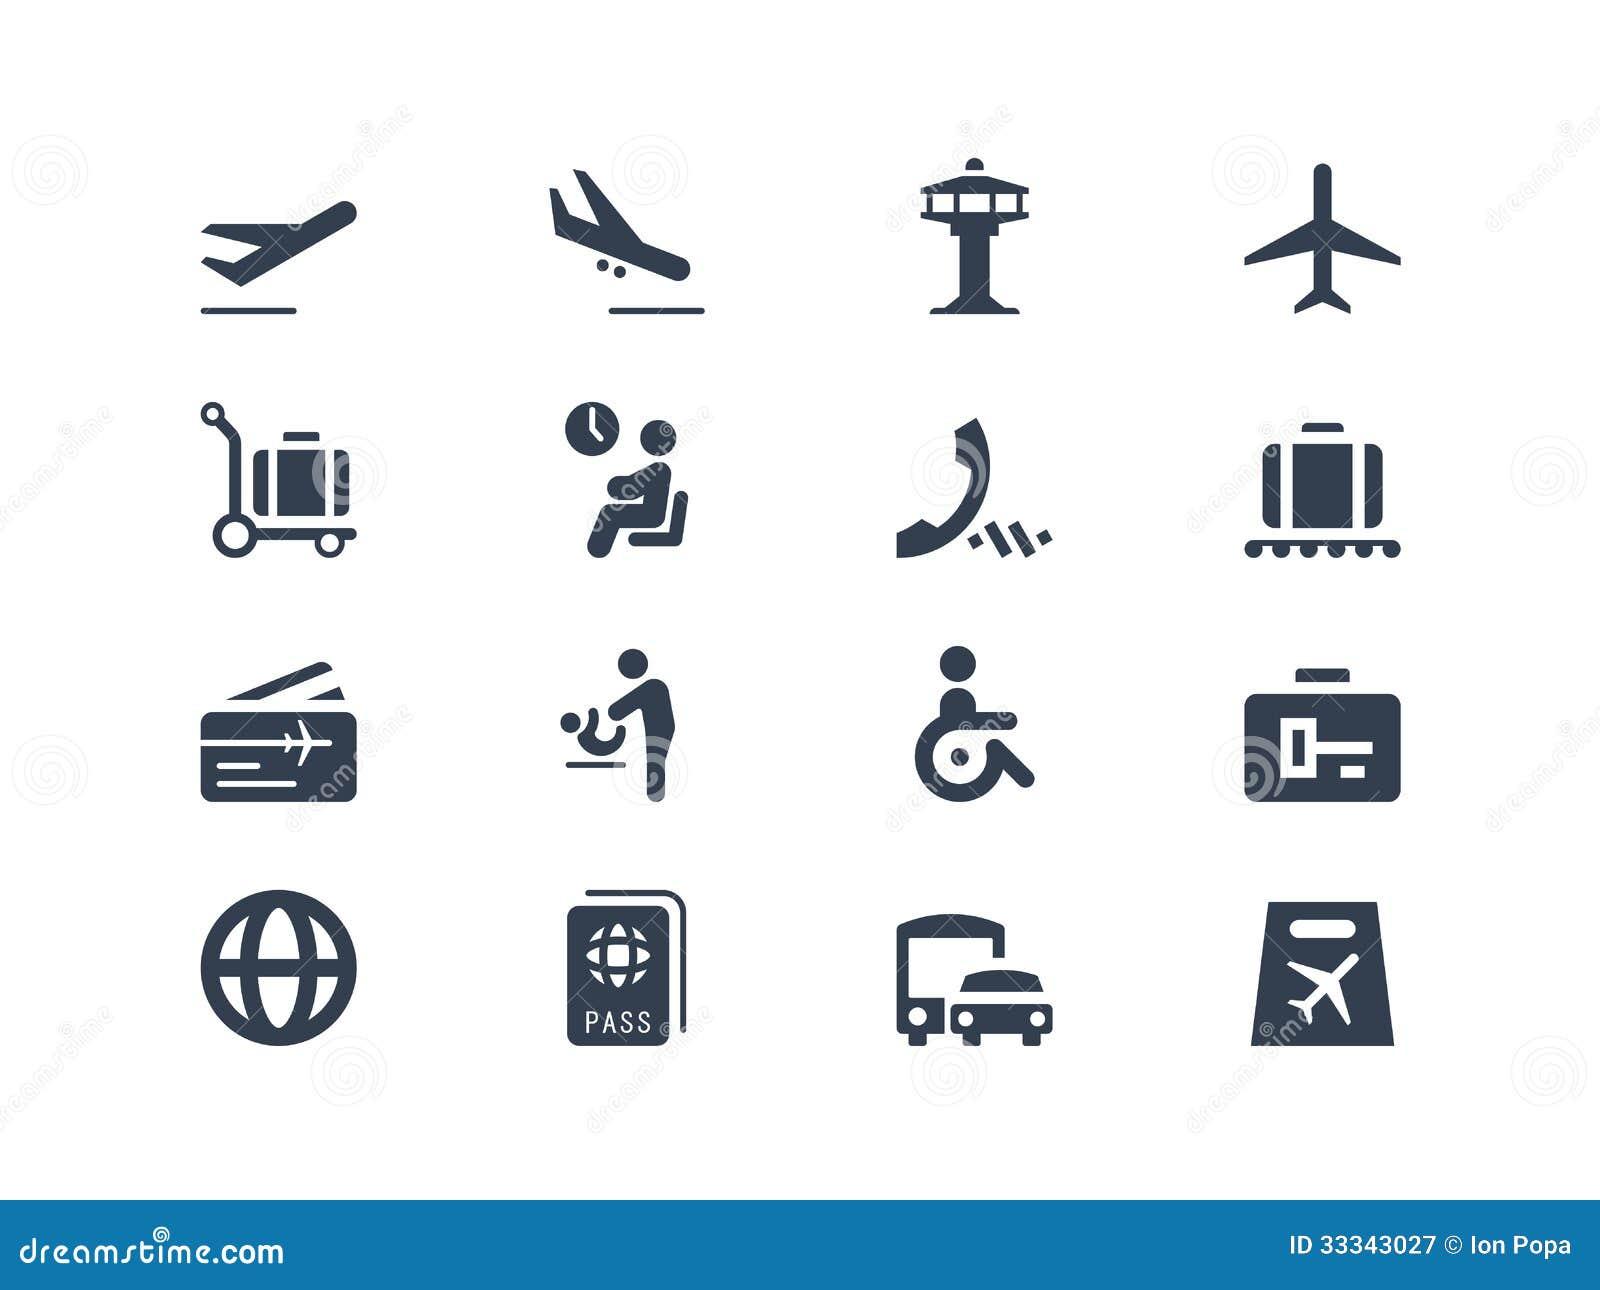 airport icons royalty free stock photography image 33343027 handicap free vector logo handicap vectoriel